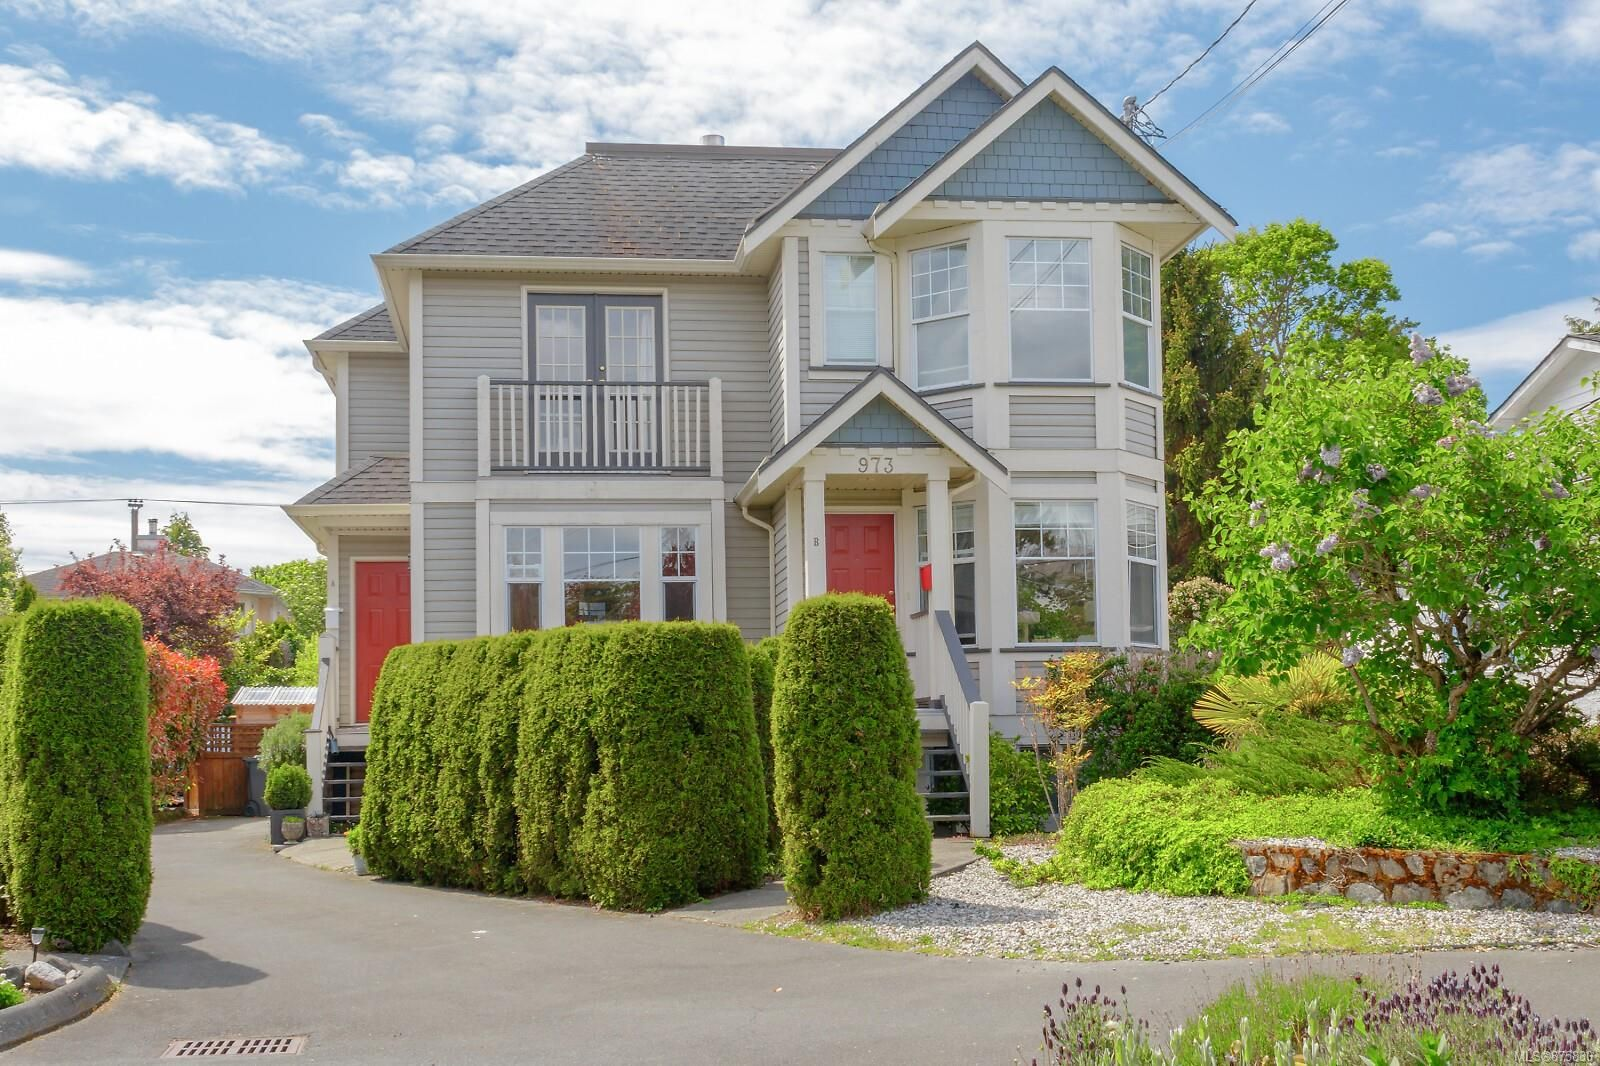 Main Photo: A 973 Dunsmuir Rd in : Es Old Esquimalt Half Duplex for sale (Esquimalt)  : MLS®# 875830